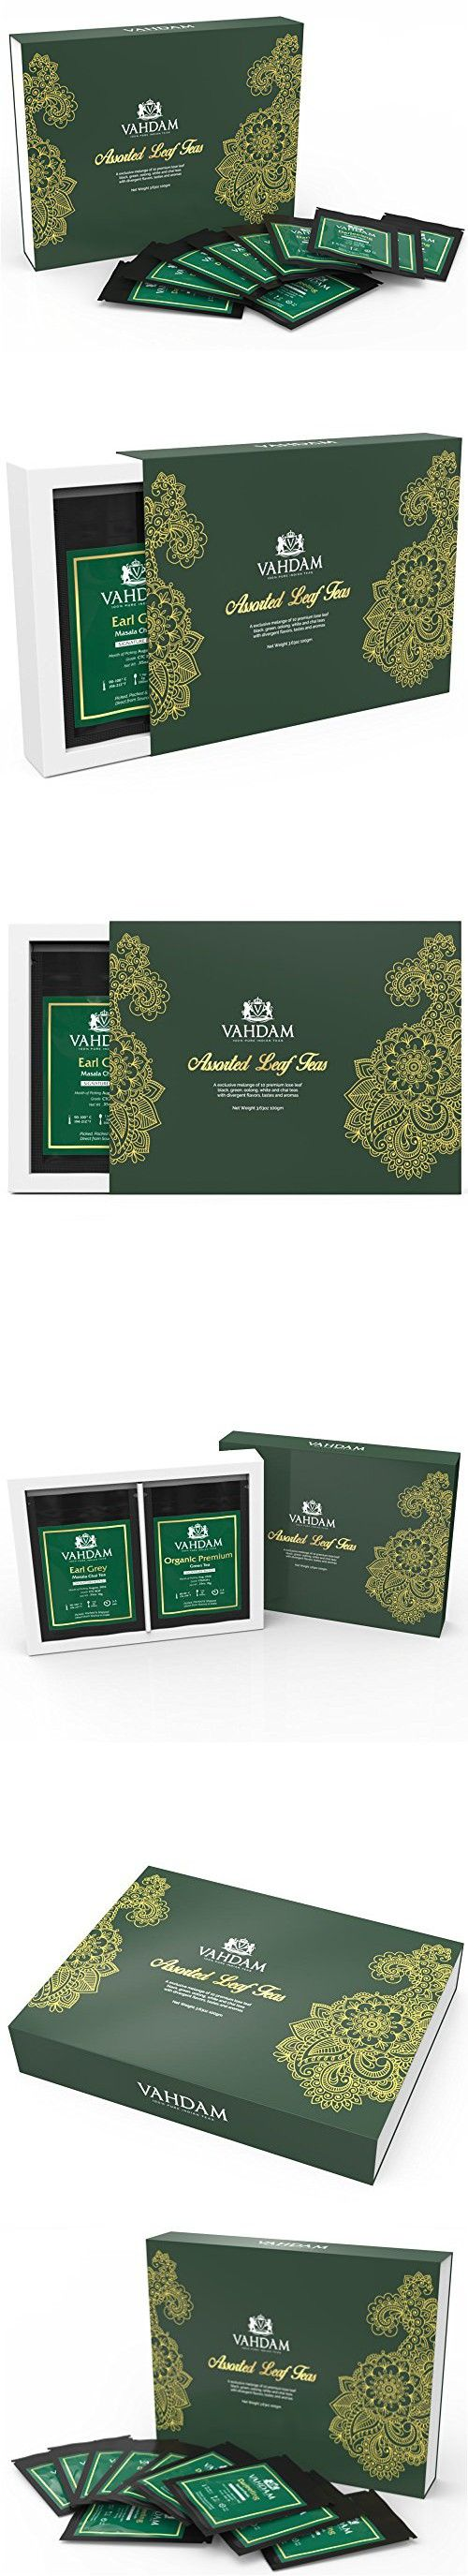 Assorted Loose Leaf  Tea , Tea Gift Set - 10  Exclusive Teas - Tea Gifts, Exotic Tea Selection, Black Tea, Green Tea, Oolong Tea, White Tea & Chai Tea - Individually Packed in a Tea Gift Box